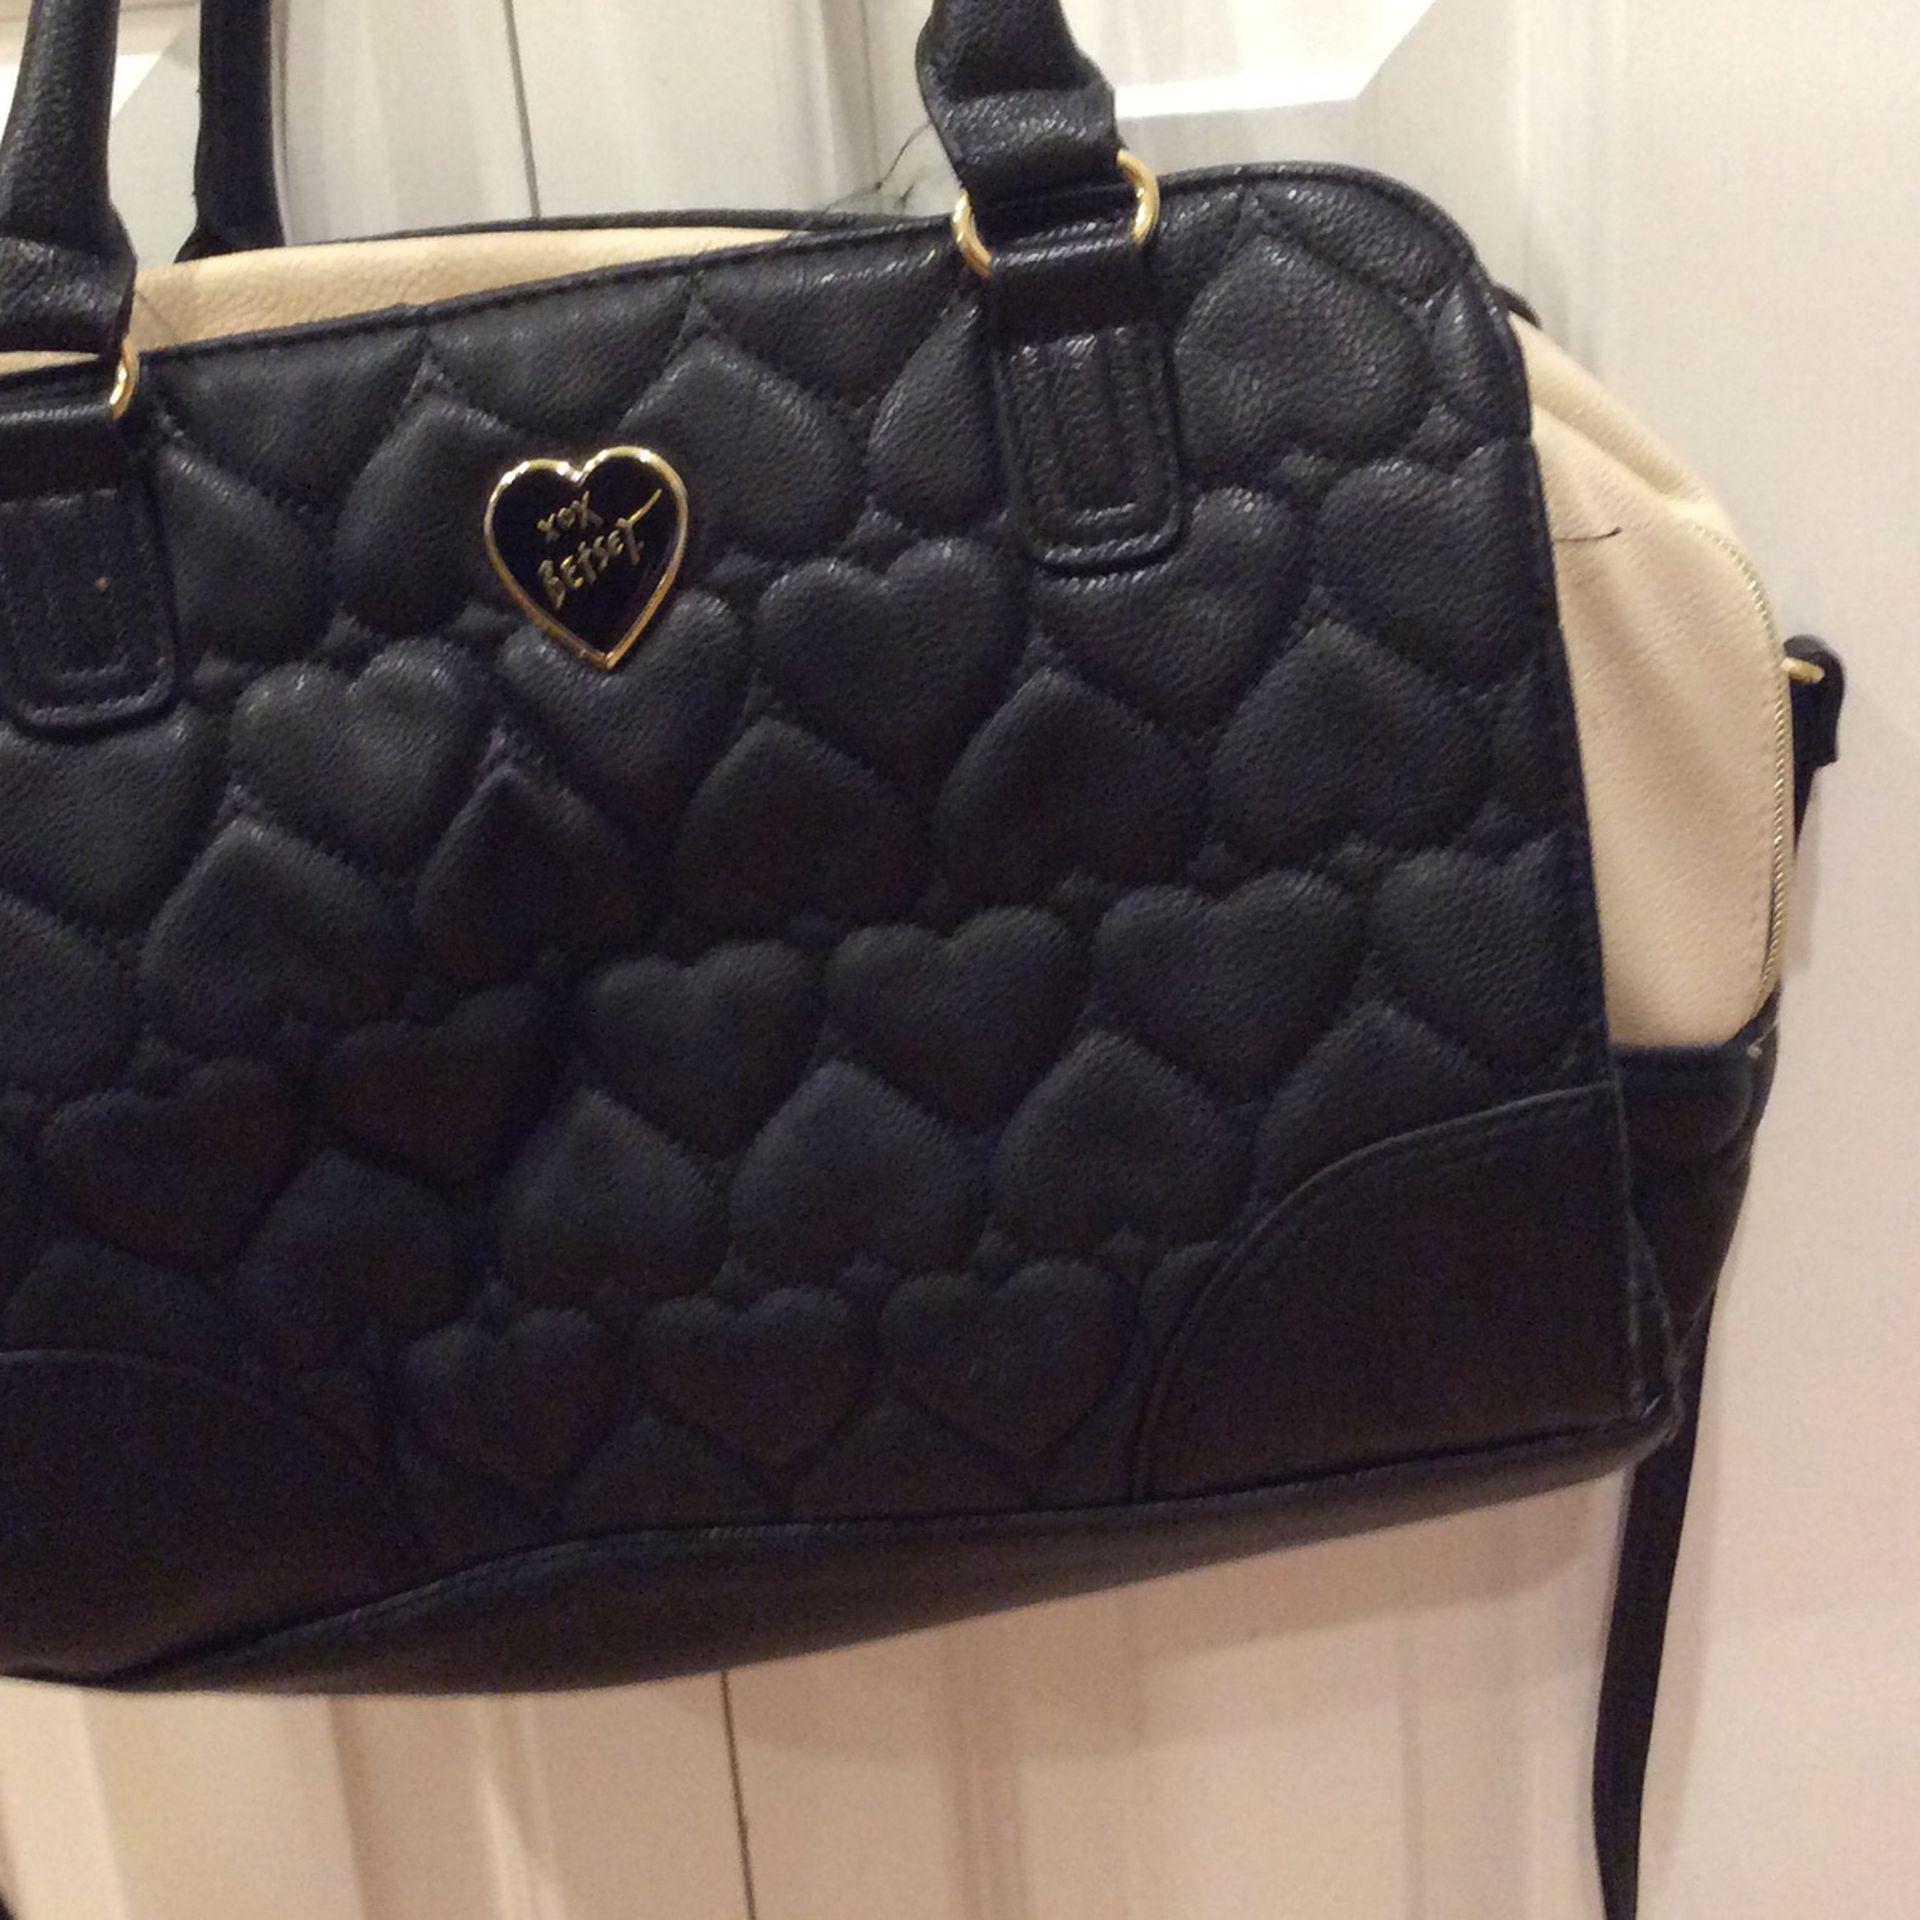 Betsy Johnson Quilted Hearts Handbag Shoulder Bag